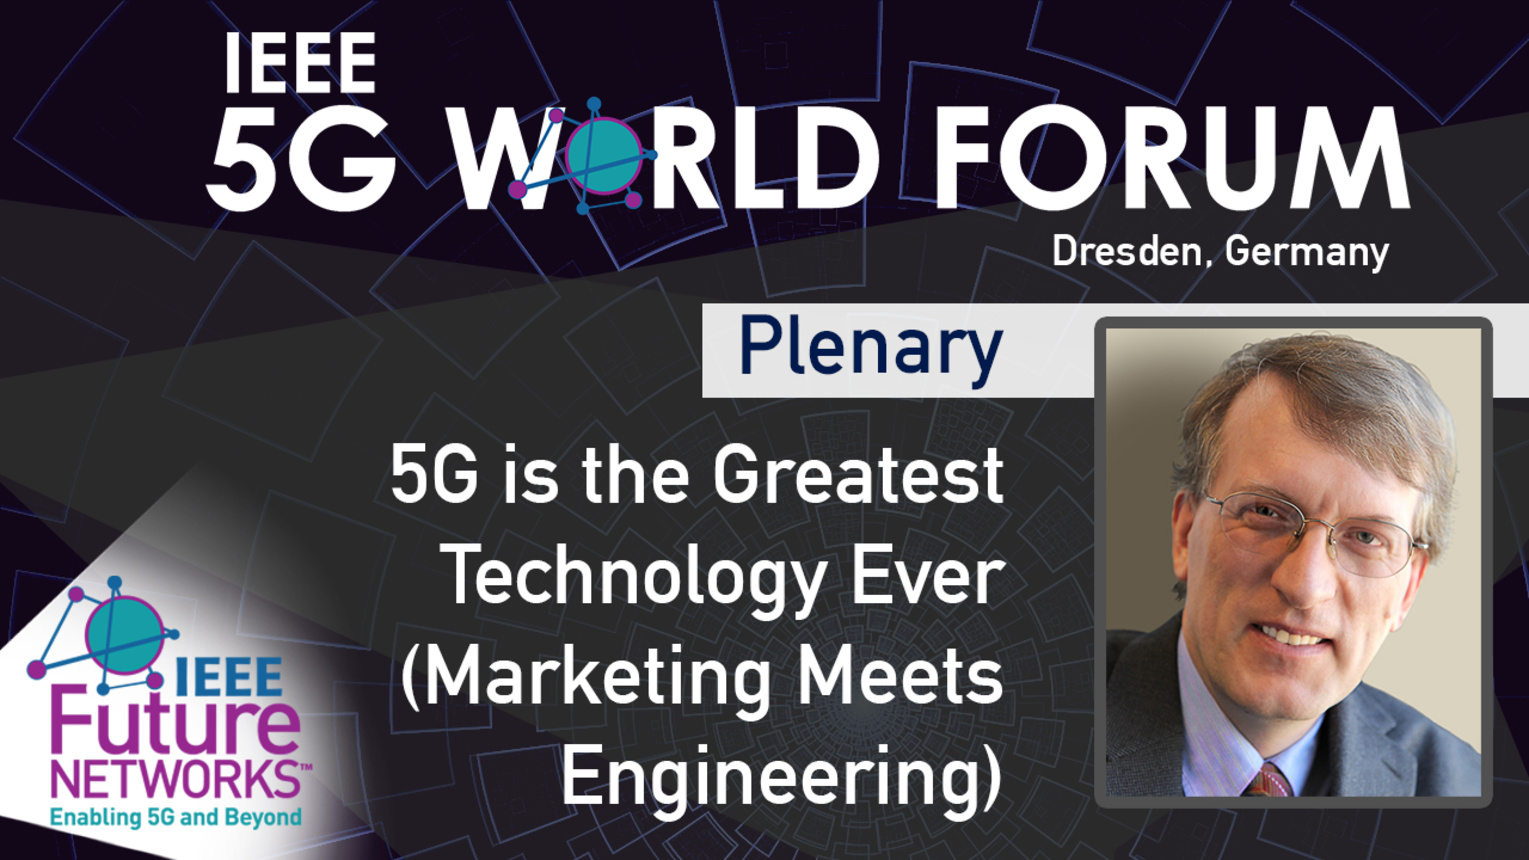 5G is the Greatest Technology Ever (Marketing Meets Engineering) - Henning Schulzrinne - 5G World Forum Dresden, 2019